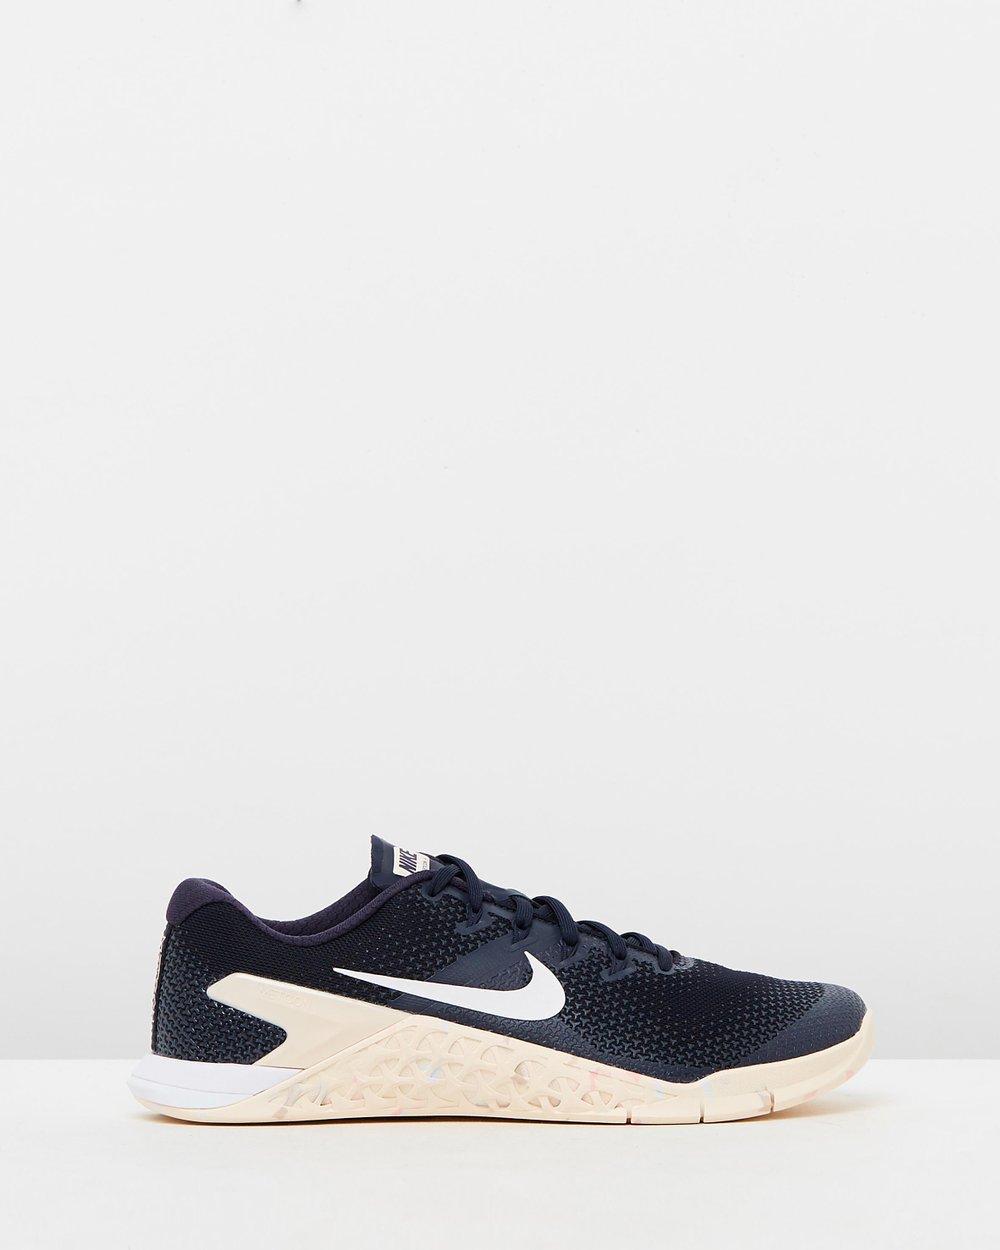 3a1bcd8fb52 Metcon 4 - Women s by Nike Online